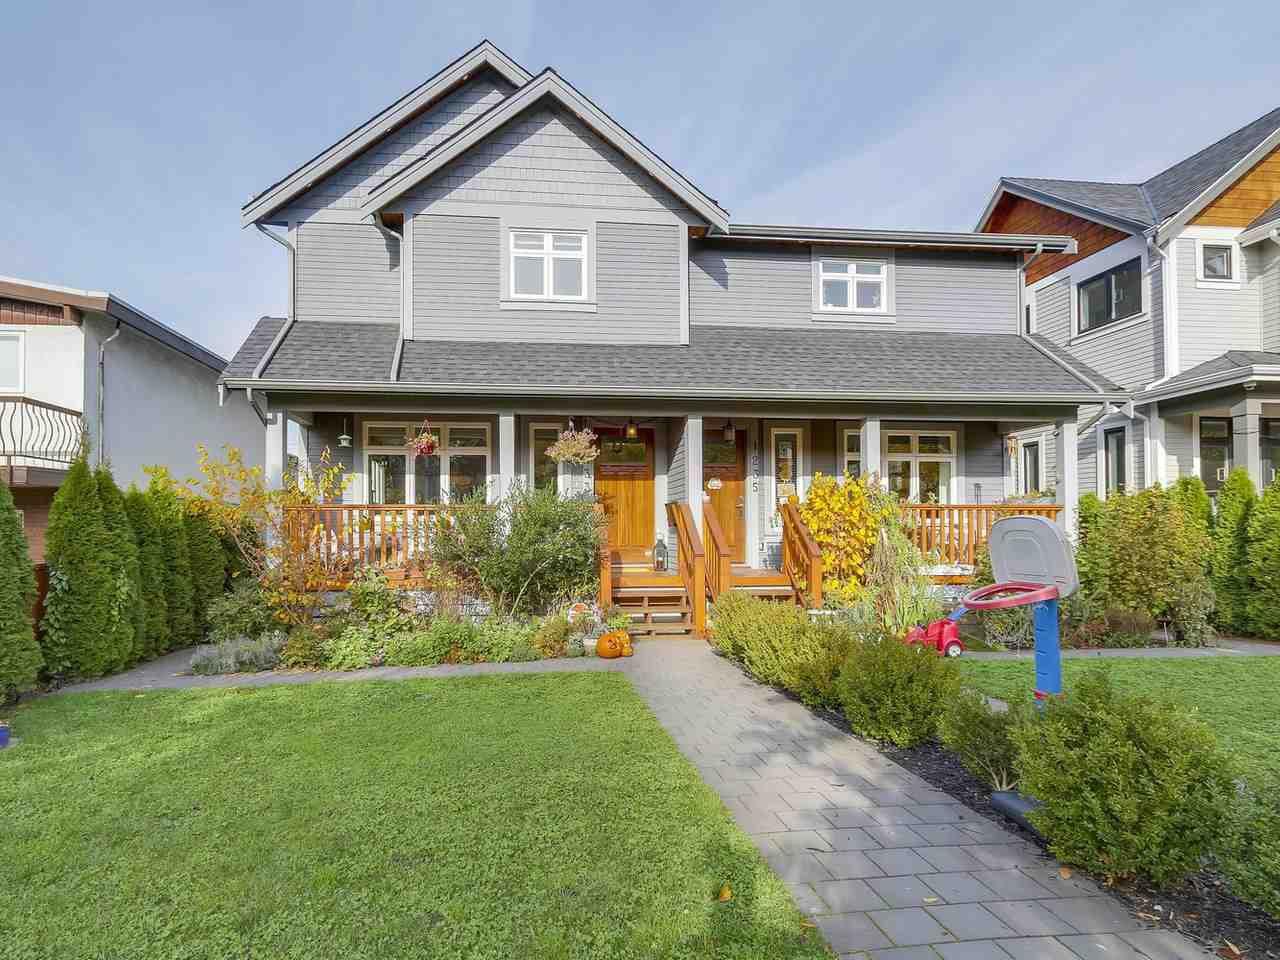 "Main Photo: 1233 E 13 Avenue in Vancouver: Mount Pleasant VE House 1/2 Duplex for sale in ""MOUNT PLEASANT"" (Vancouver East)  : MLS®# R2218973"